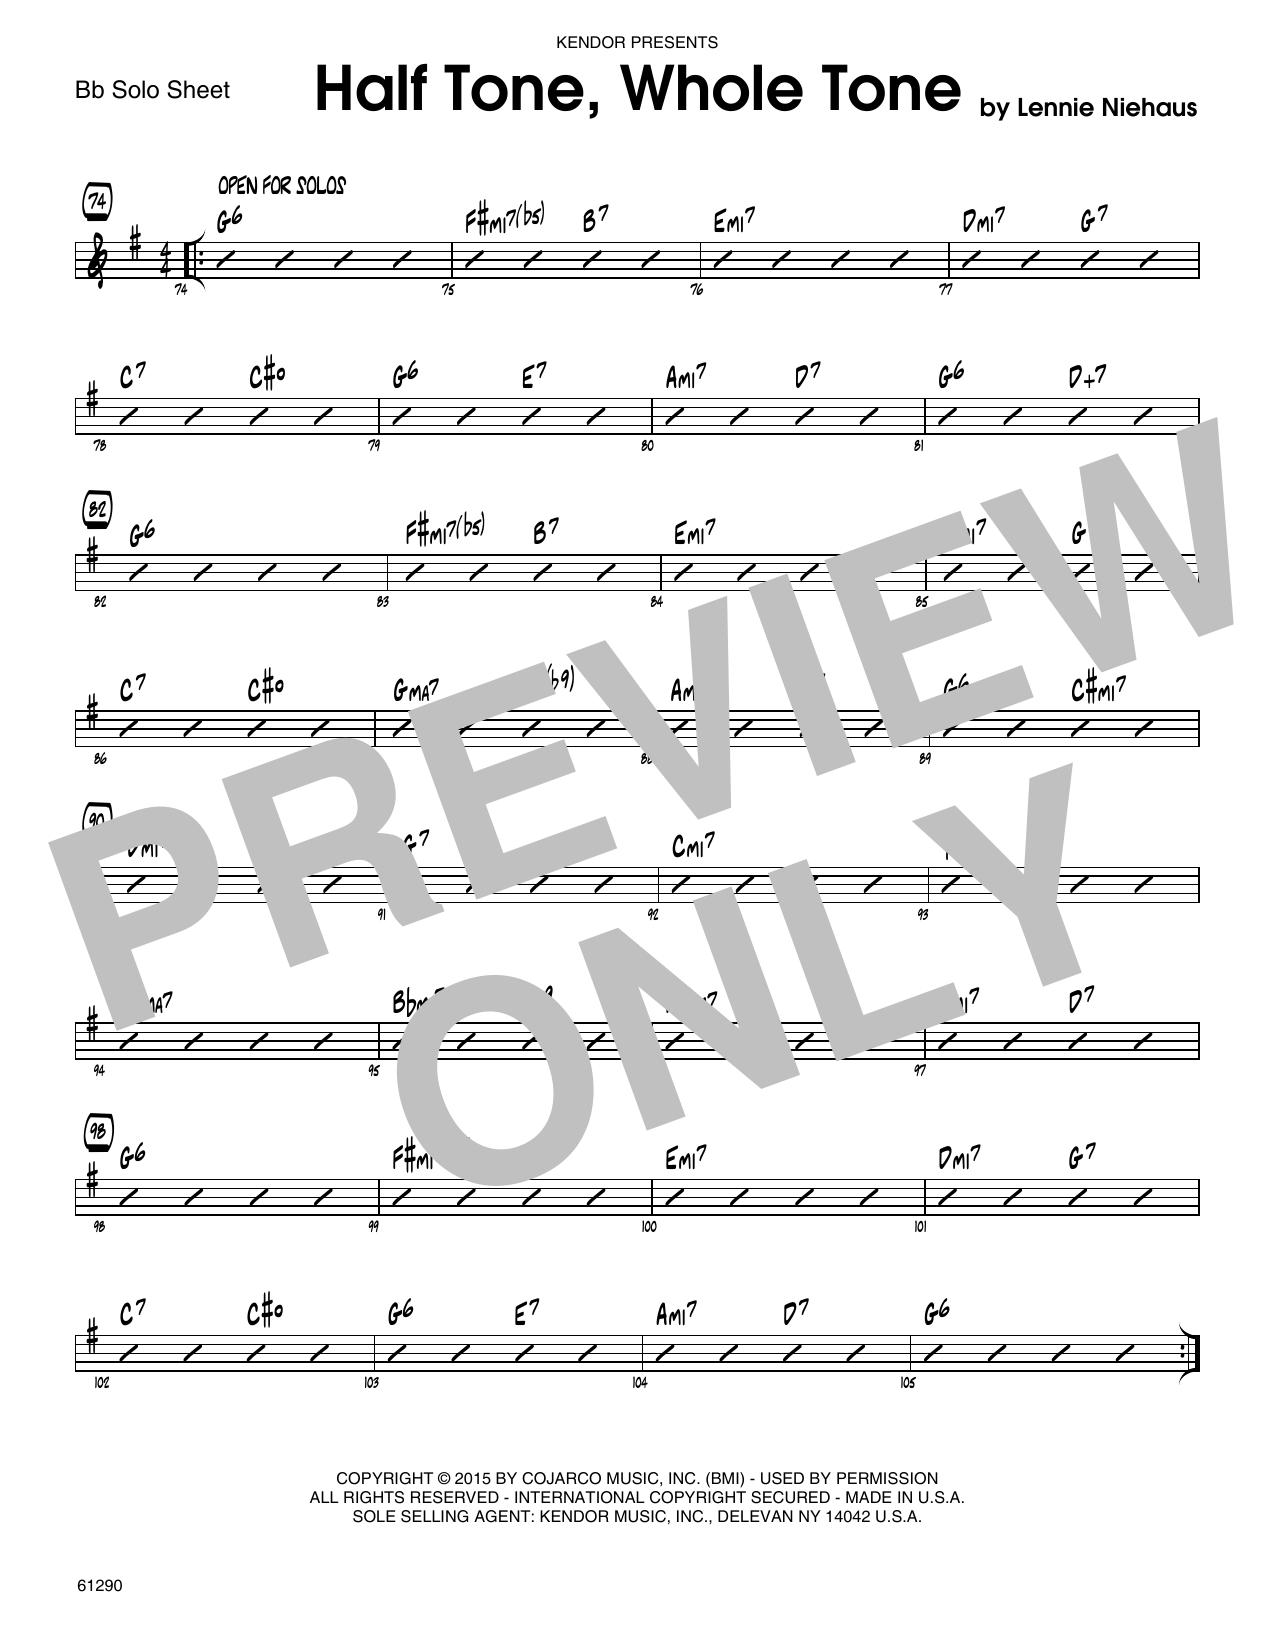 Half Tone, Whole Tone - Bb Solo Sheet Sheet Music